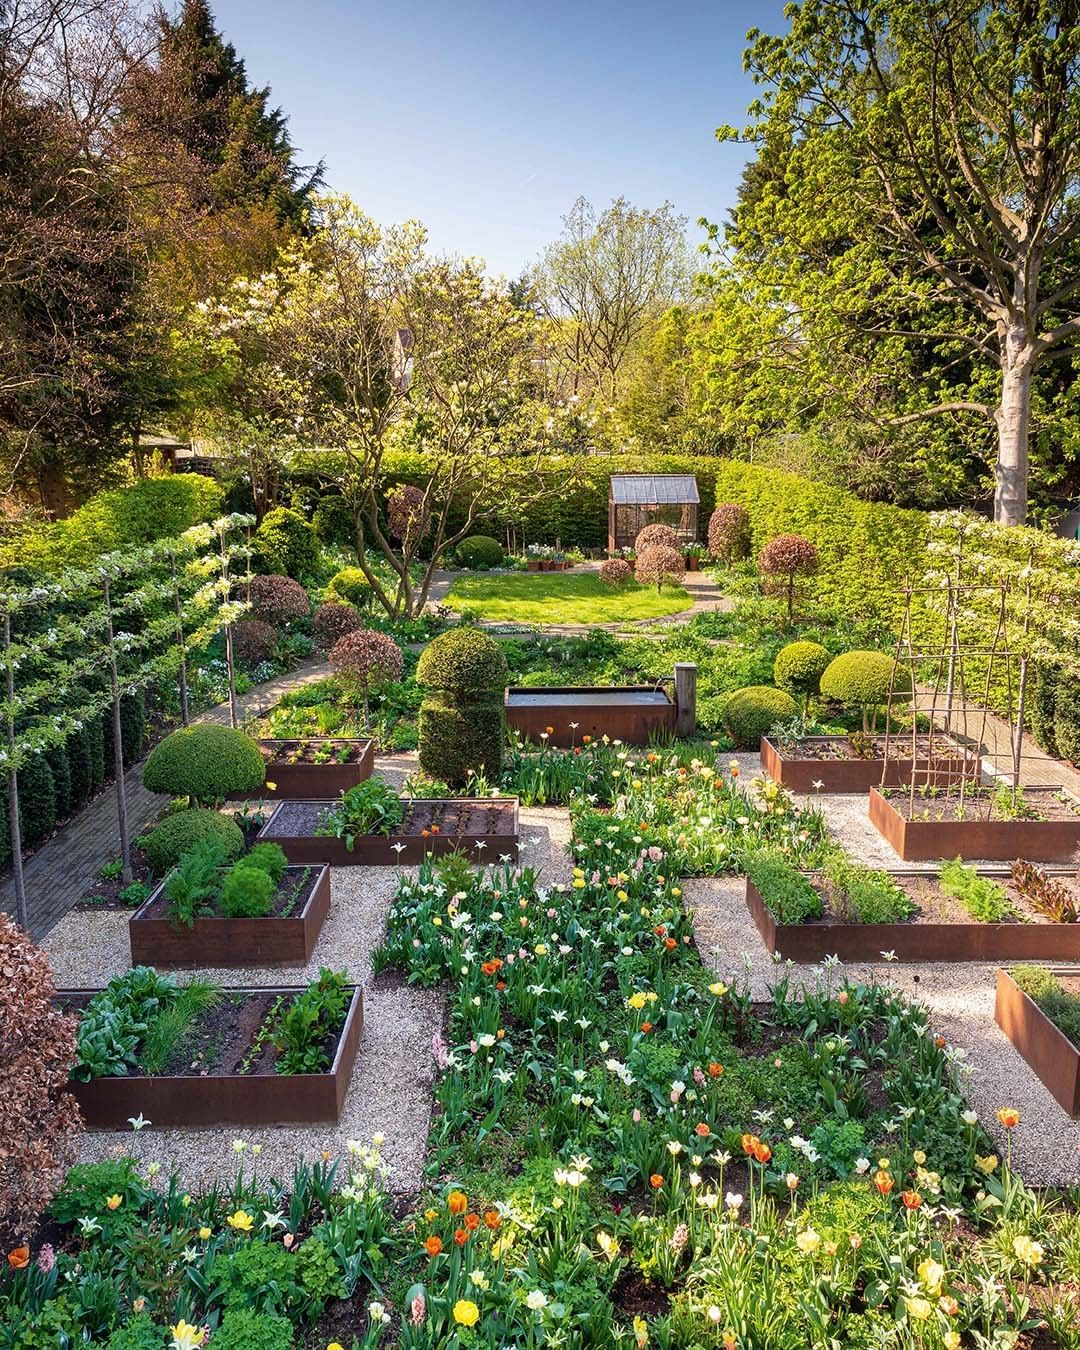 Gardens Illustrated On Instagram As Nationalgardeningweek Begins We Wanted To Share This Stunning Fruit Garden Design Vegetable Garden Design London Garden